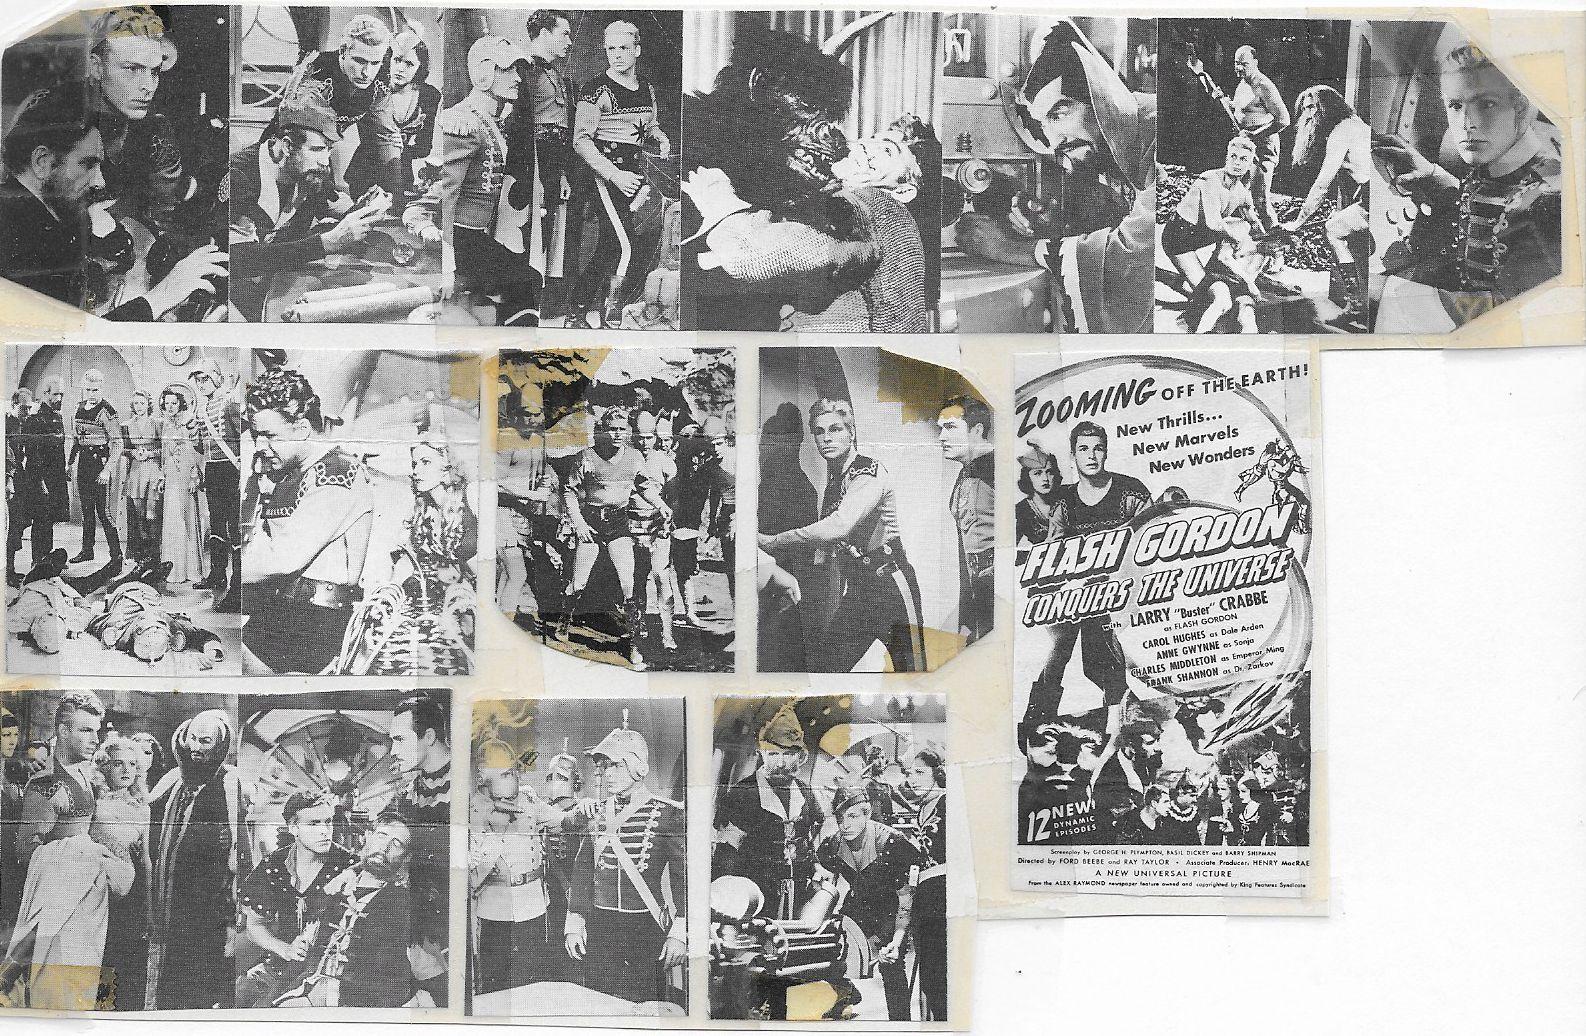 Buster Crabbe, Shirley Deane, Roland Drew, Edgar Edwards, Anne Gwynne, Carol Hughes, Charles Middleton, Lee Powell, Don Rowan, and Frank Shannon in Flash Gordon Conquers the Universe (1940)